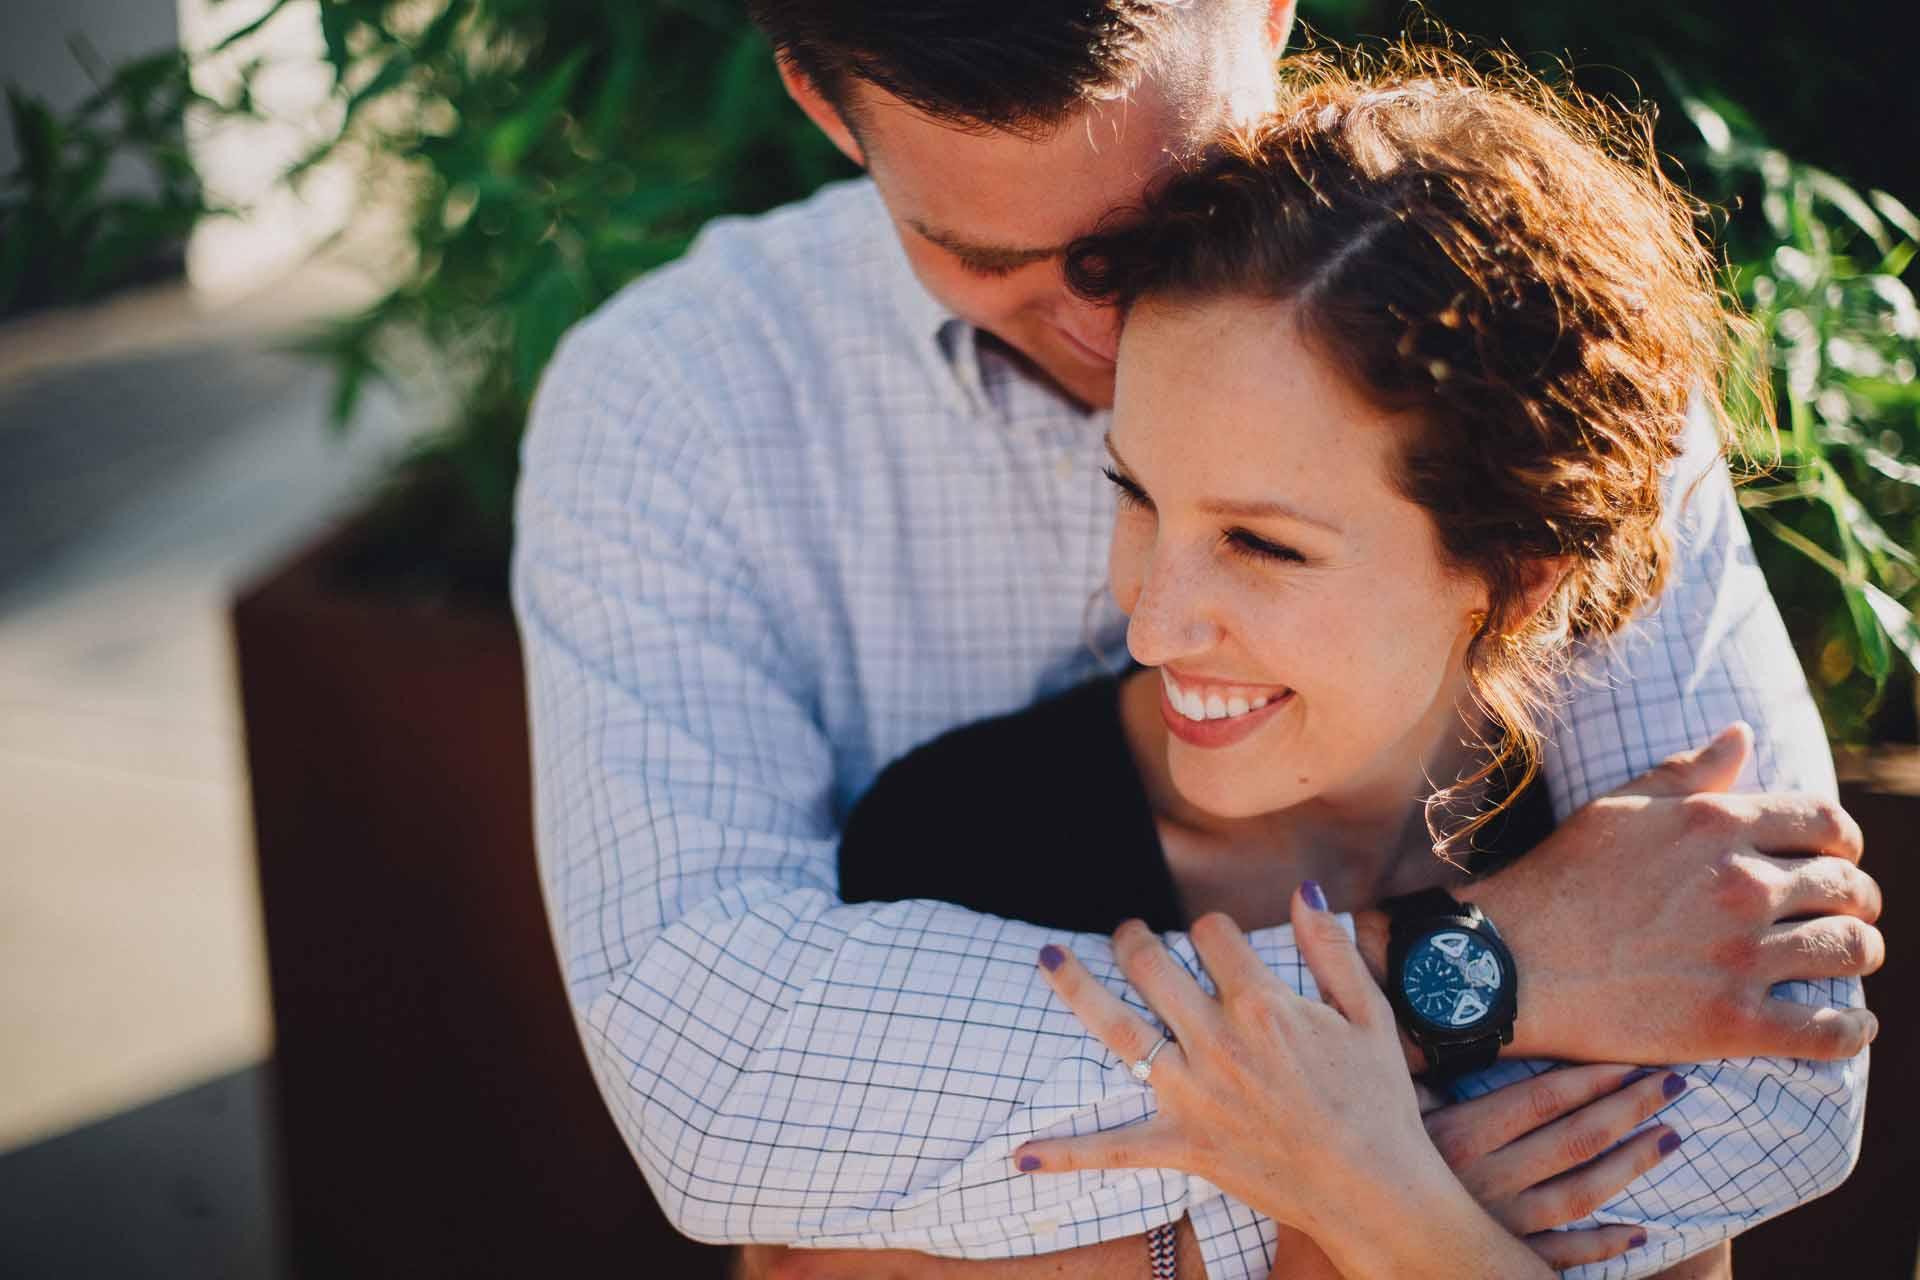 Emily-Dan-Dayton-Engagement-020@2x.jpg